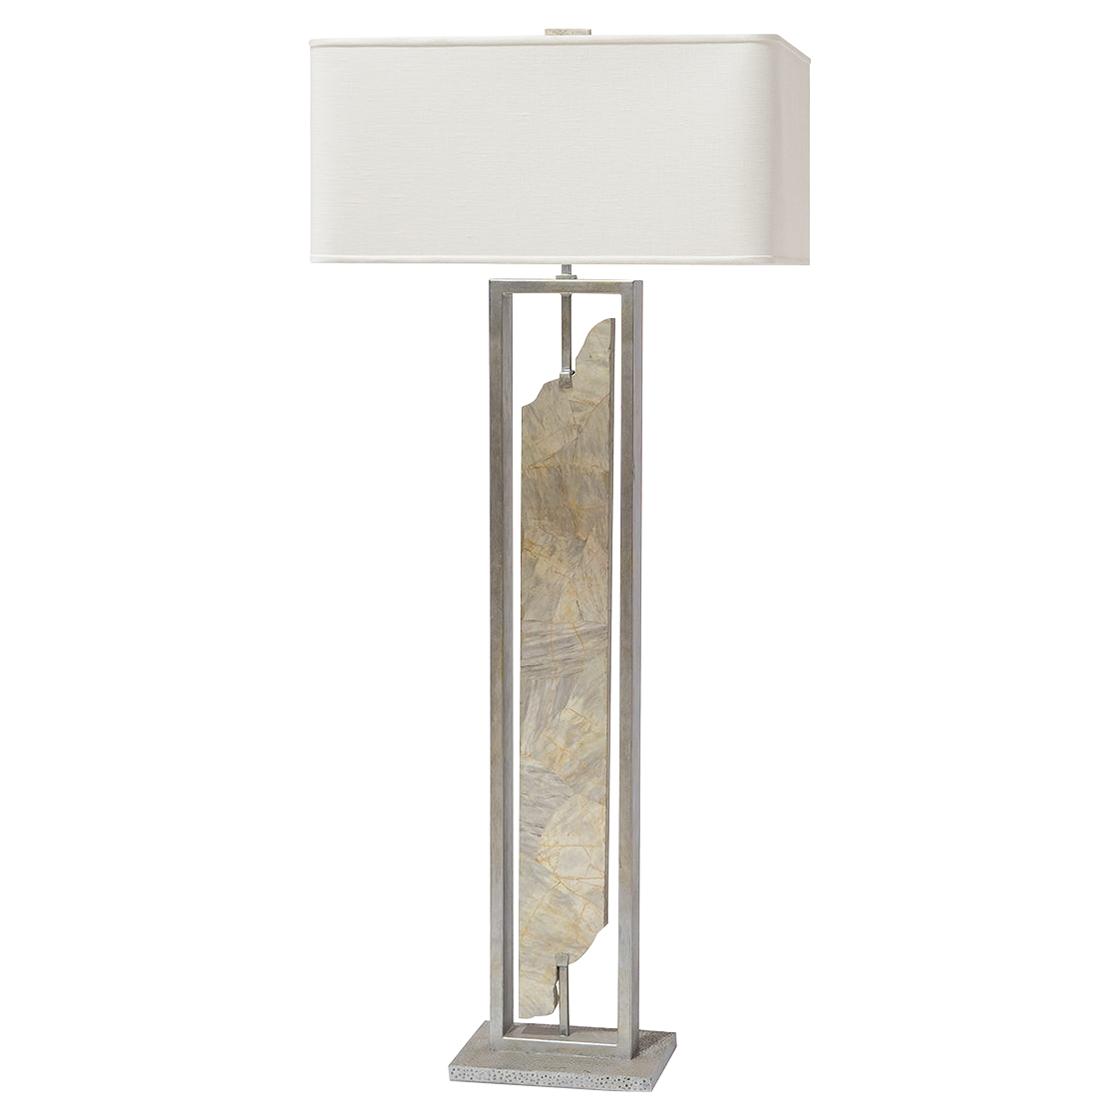 Designer floor lamps eclectic floor lamps kathy kuo home palecek soloman modern classic marble metal base floor lamp aloadofball Choice Image